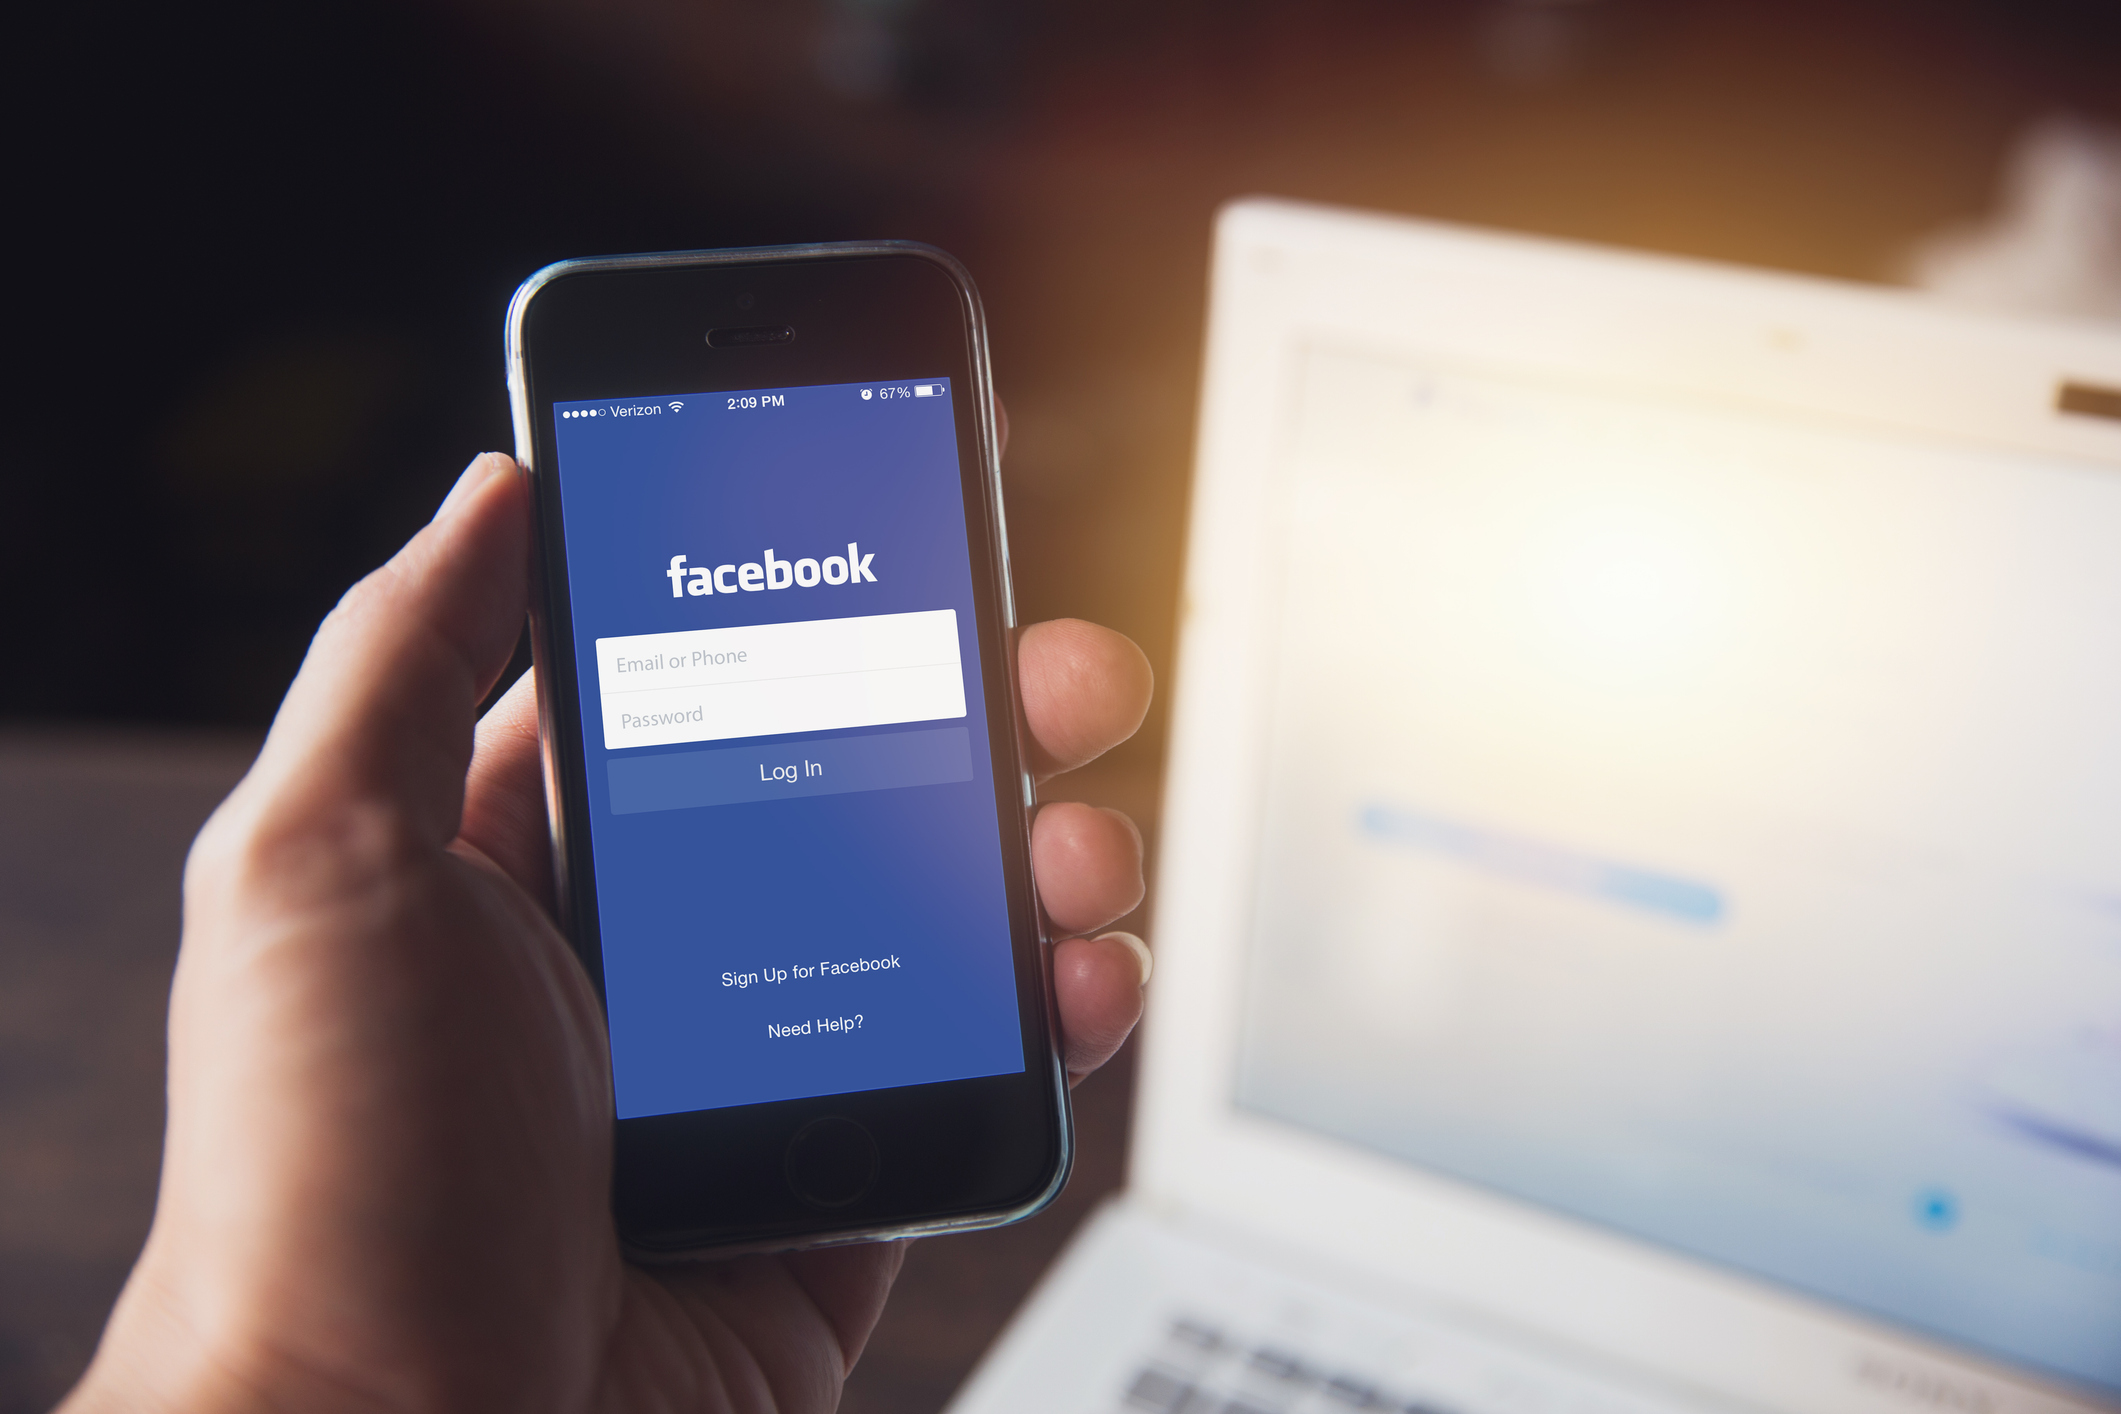 Facebook Lite: Join Over 1 Billion Users Saving Phone Data